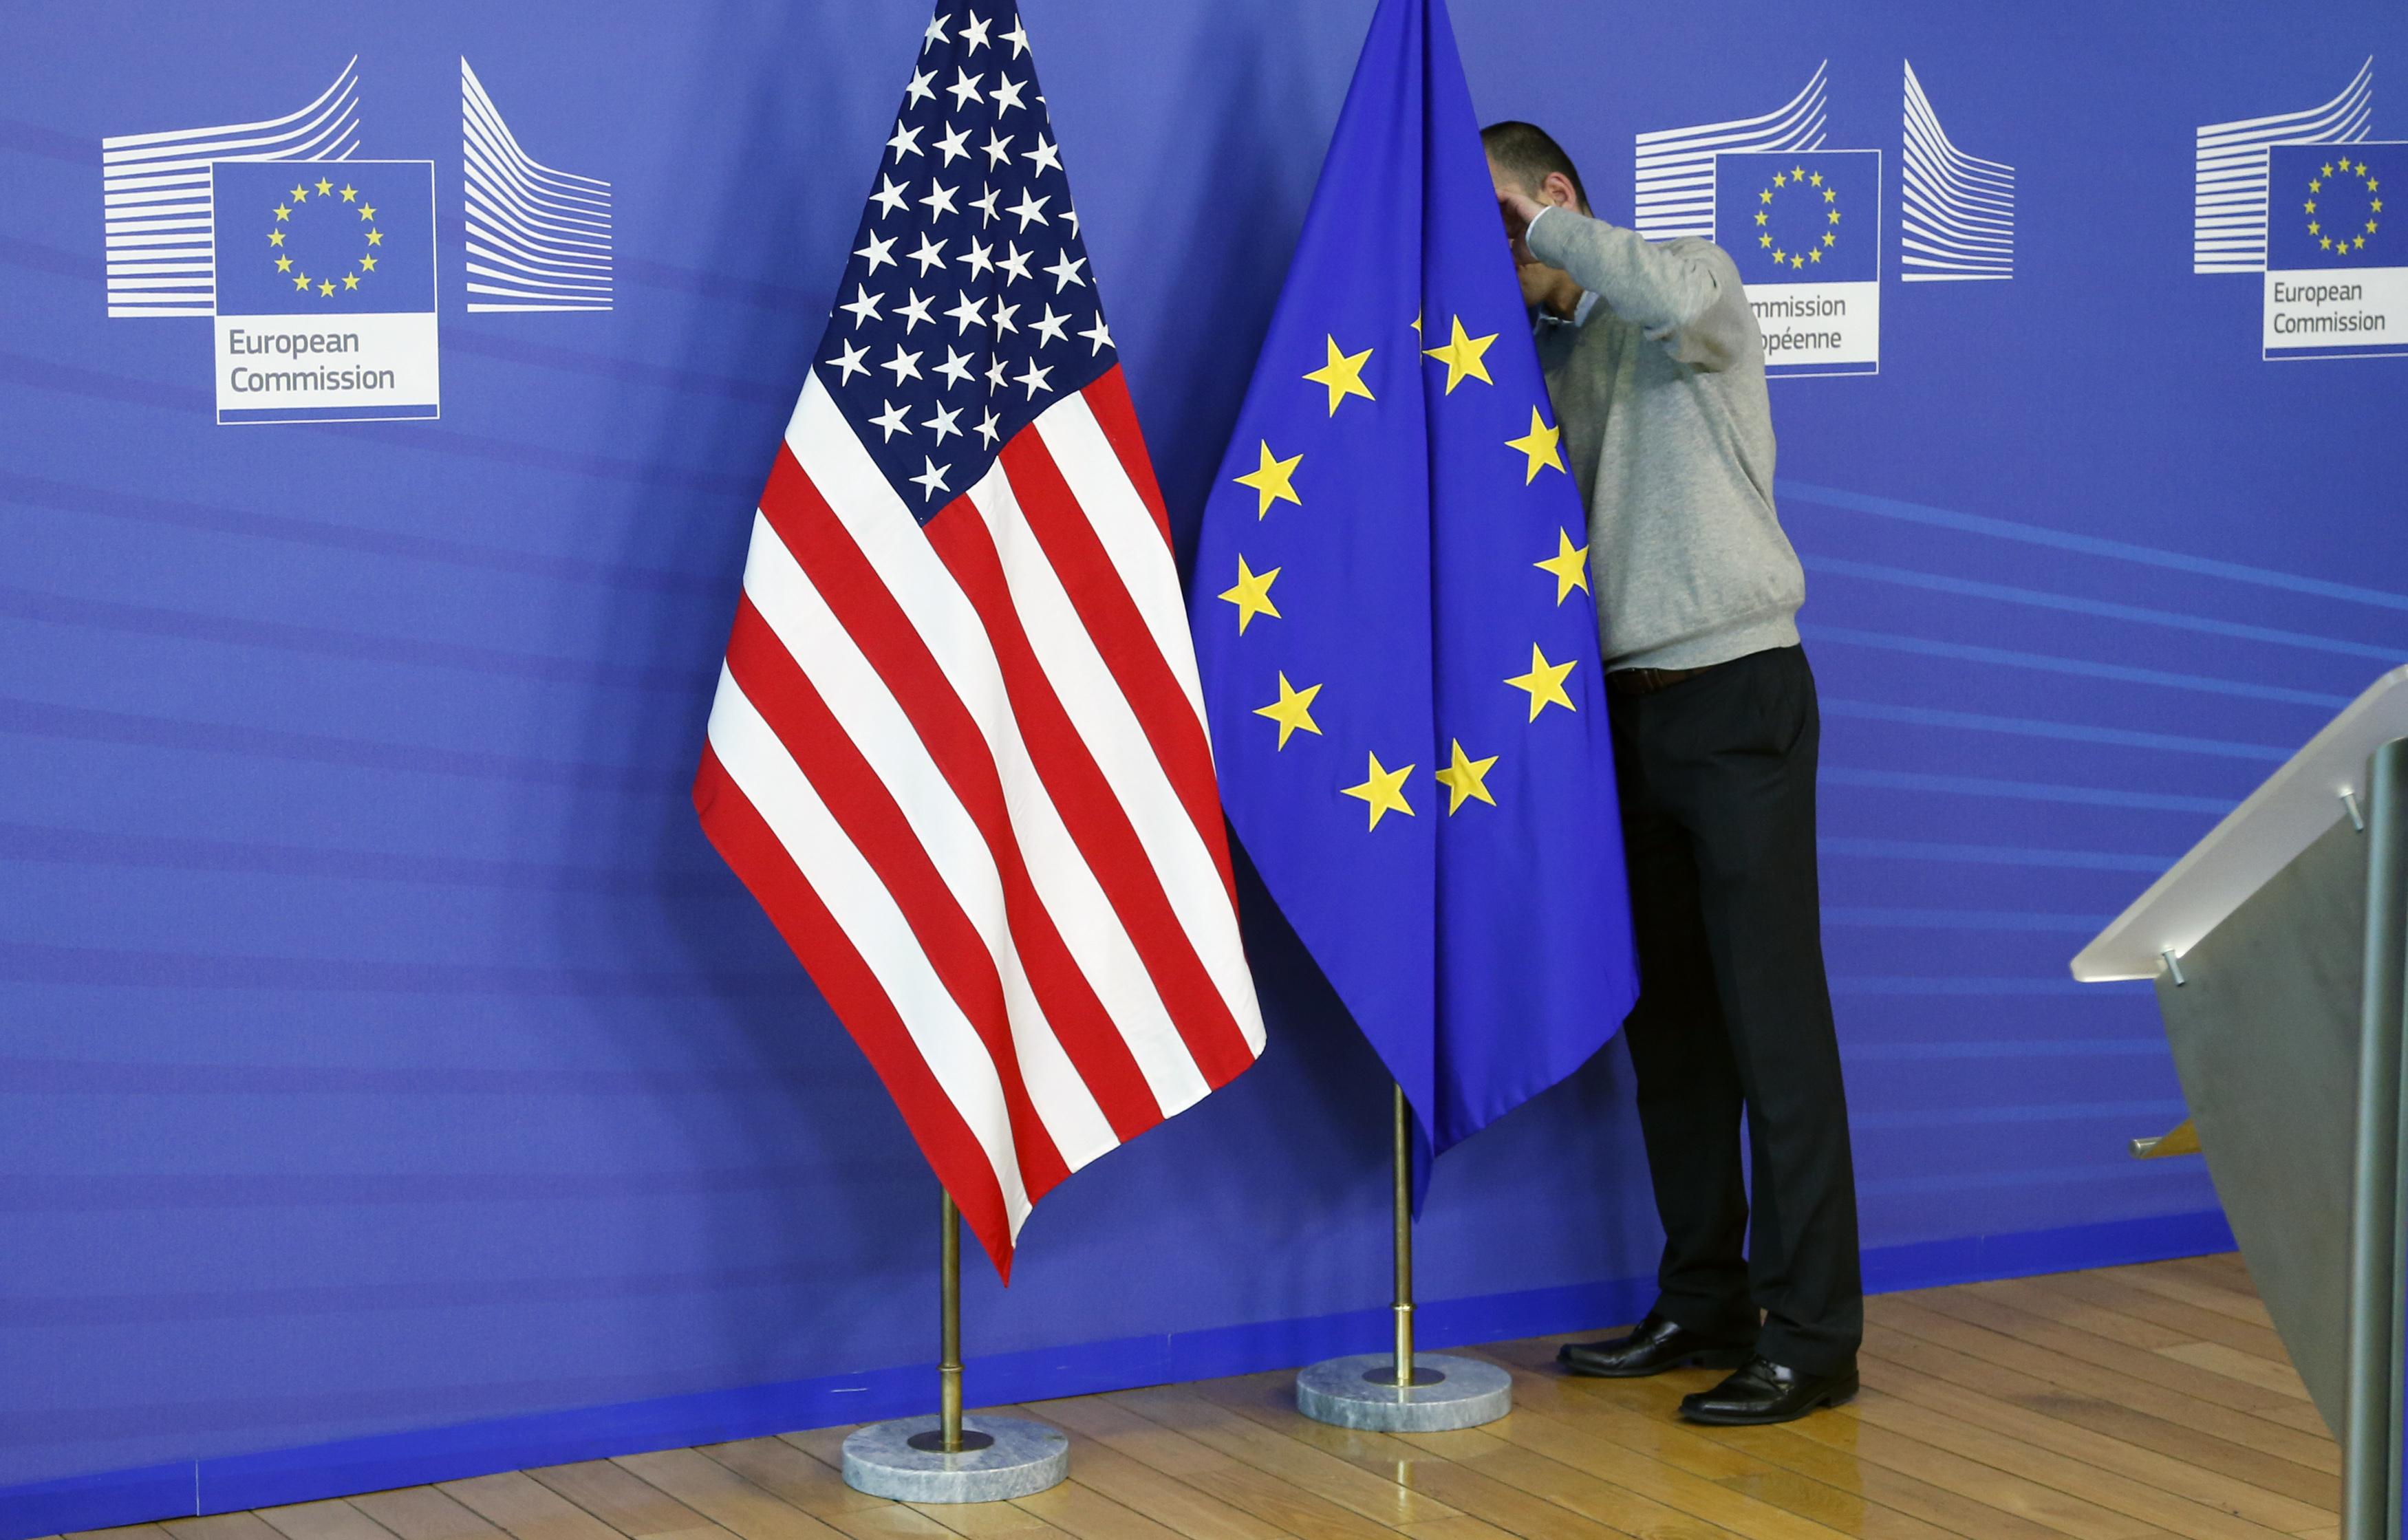 Examining The Eu Safe Harbor Decision And Impacts For Transatlantic